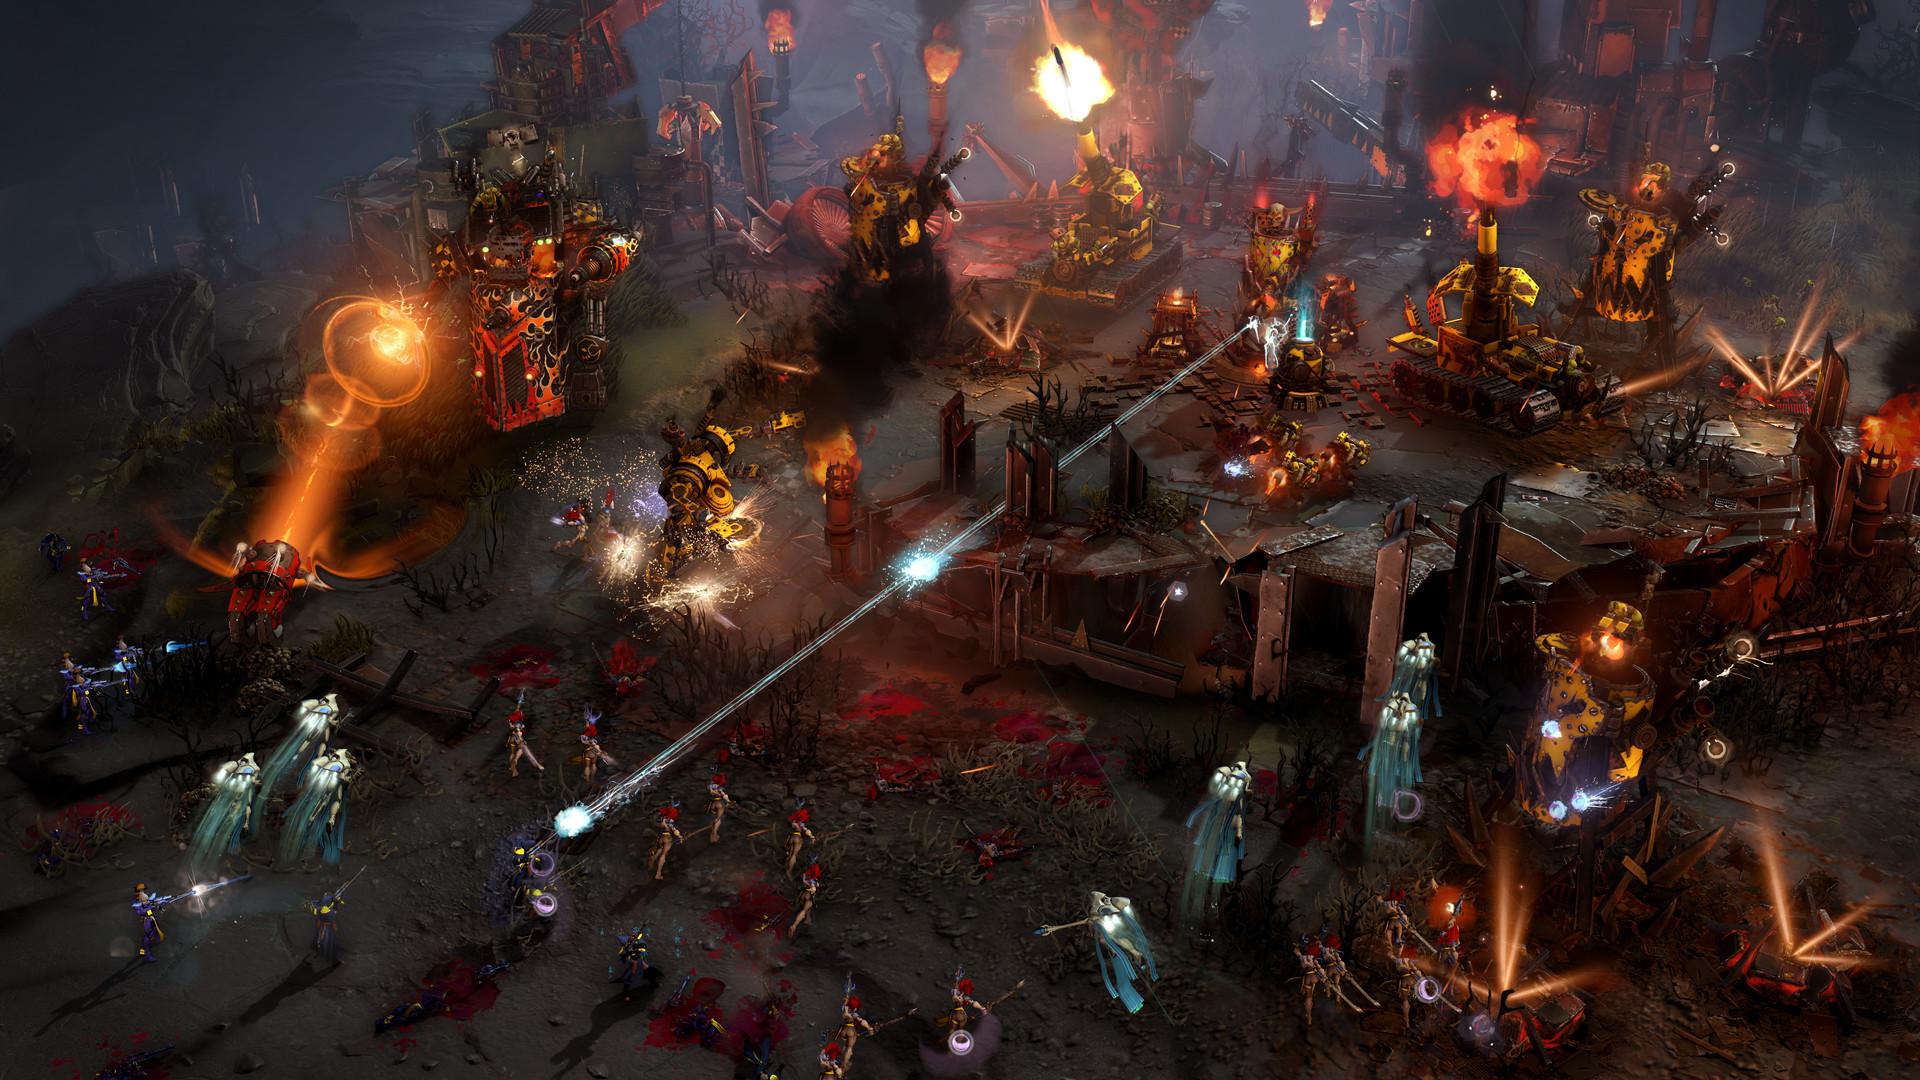 free download warhammer 40k dawn of war 3 cracked by baldman voksi include all dlc and latest update hotfix crack fix online server private copiapop diskokosmiko